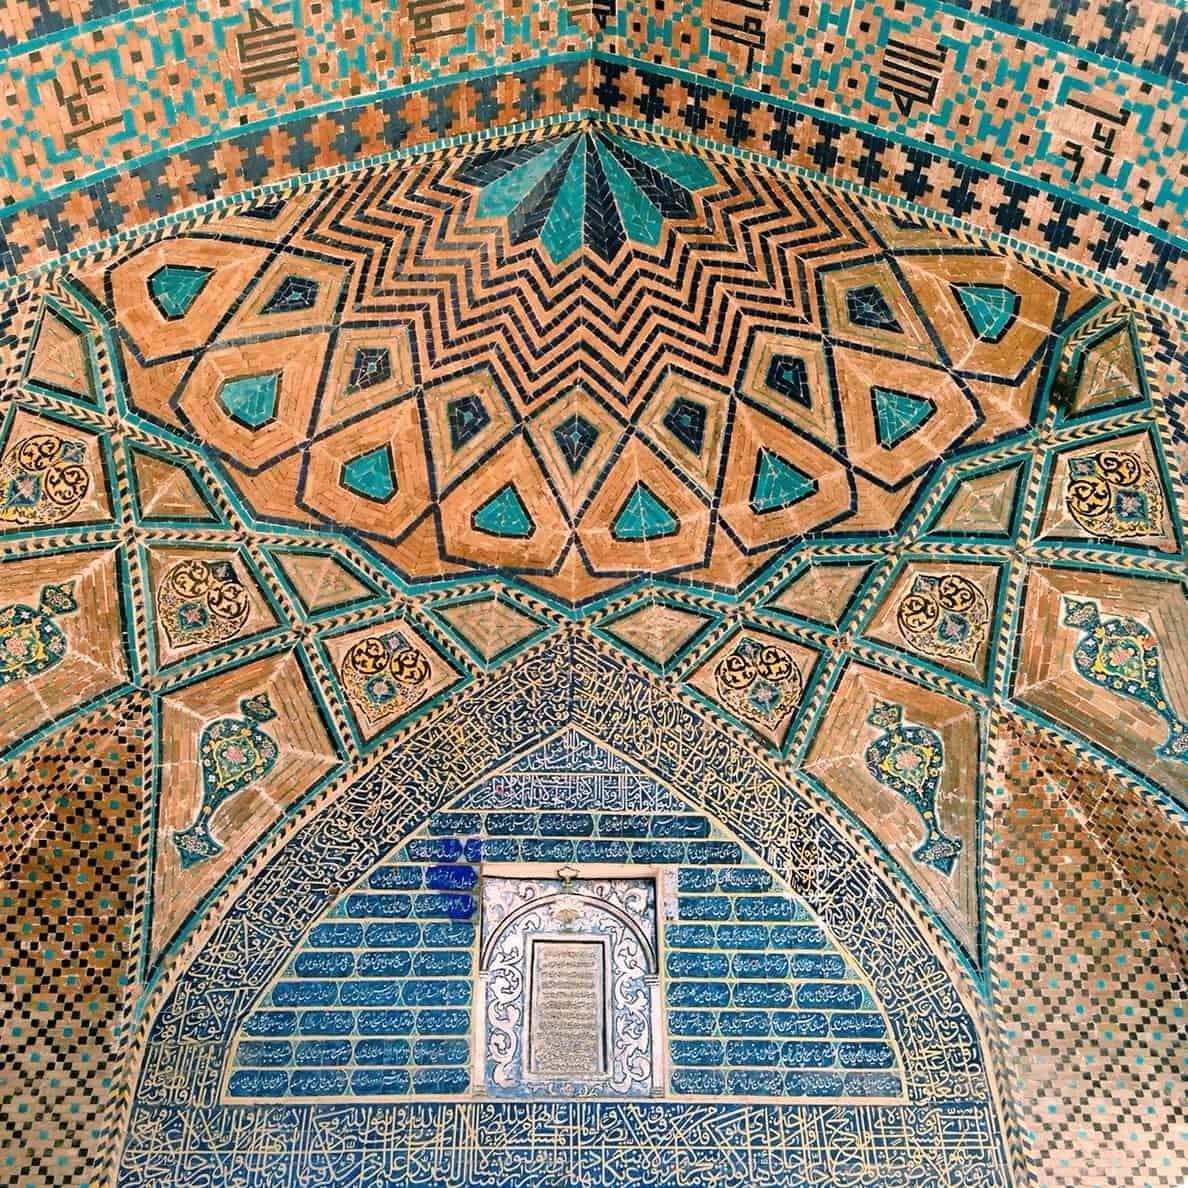 कुरन्देस्टन-जामईह मस्जिद सनन्दाज की